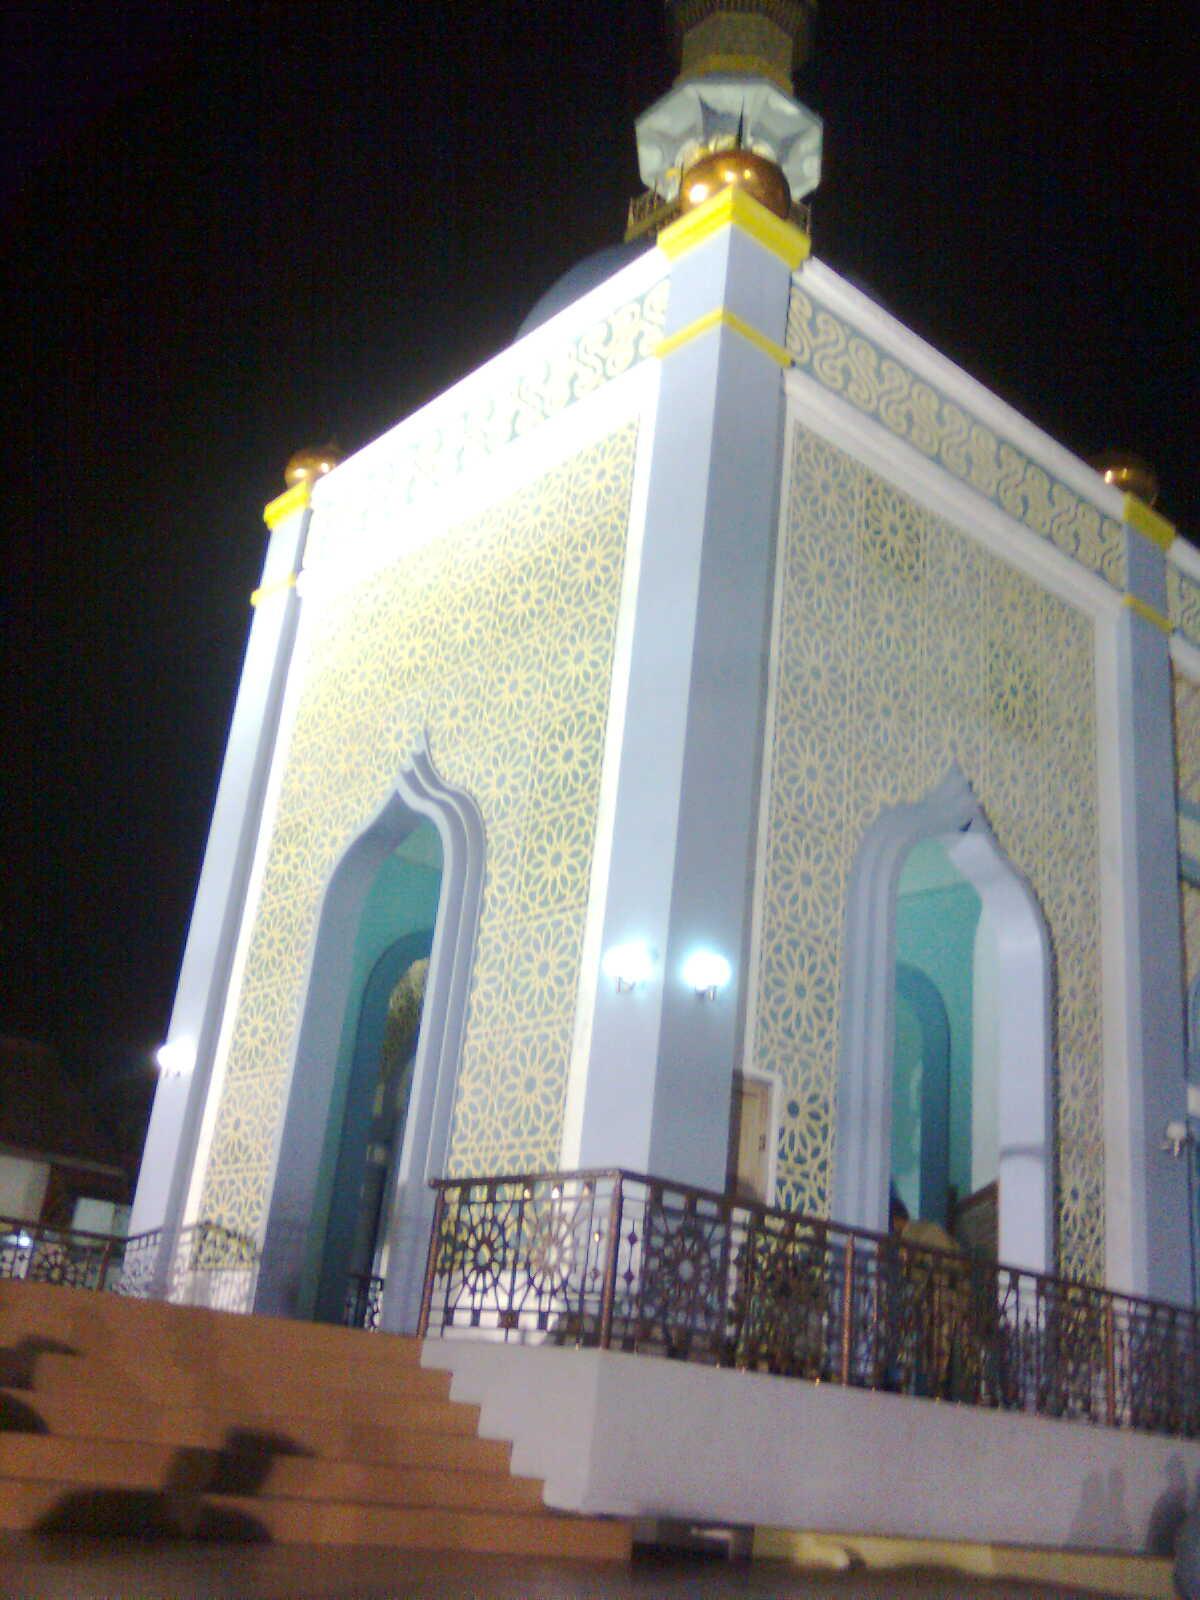 Masjid Agung Tuban Garuda Bangsa Terbesar Kabupaten Digunakan Tempat Beribadah